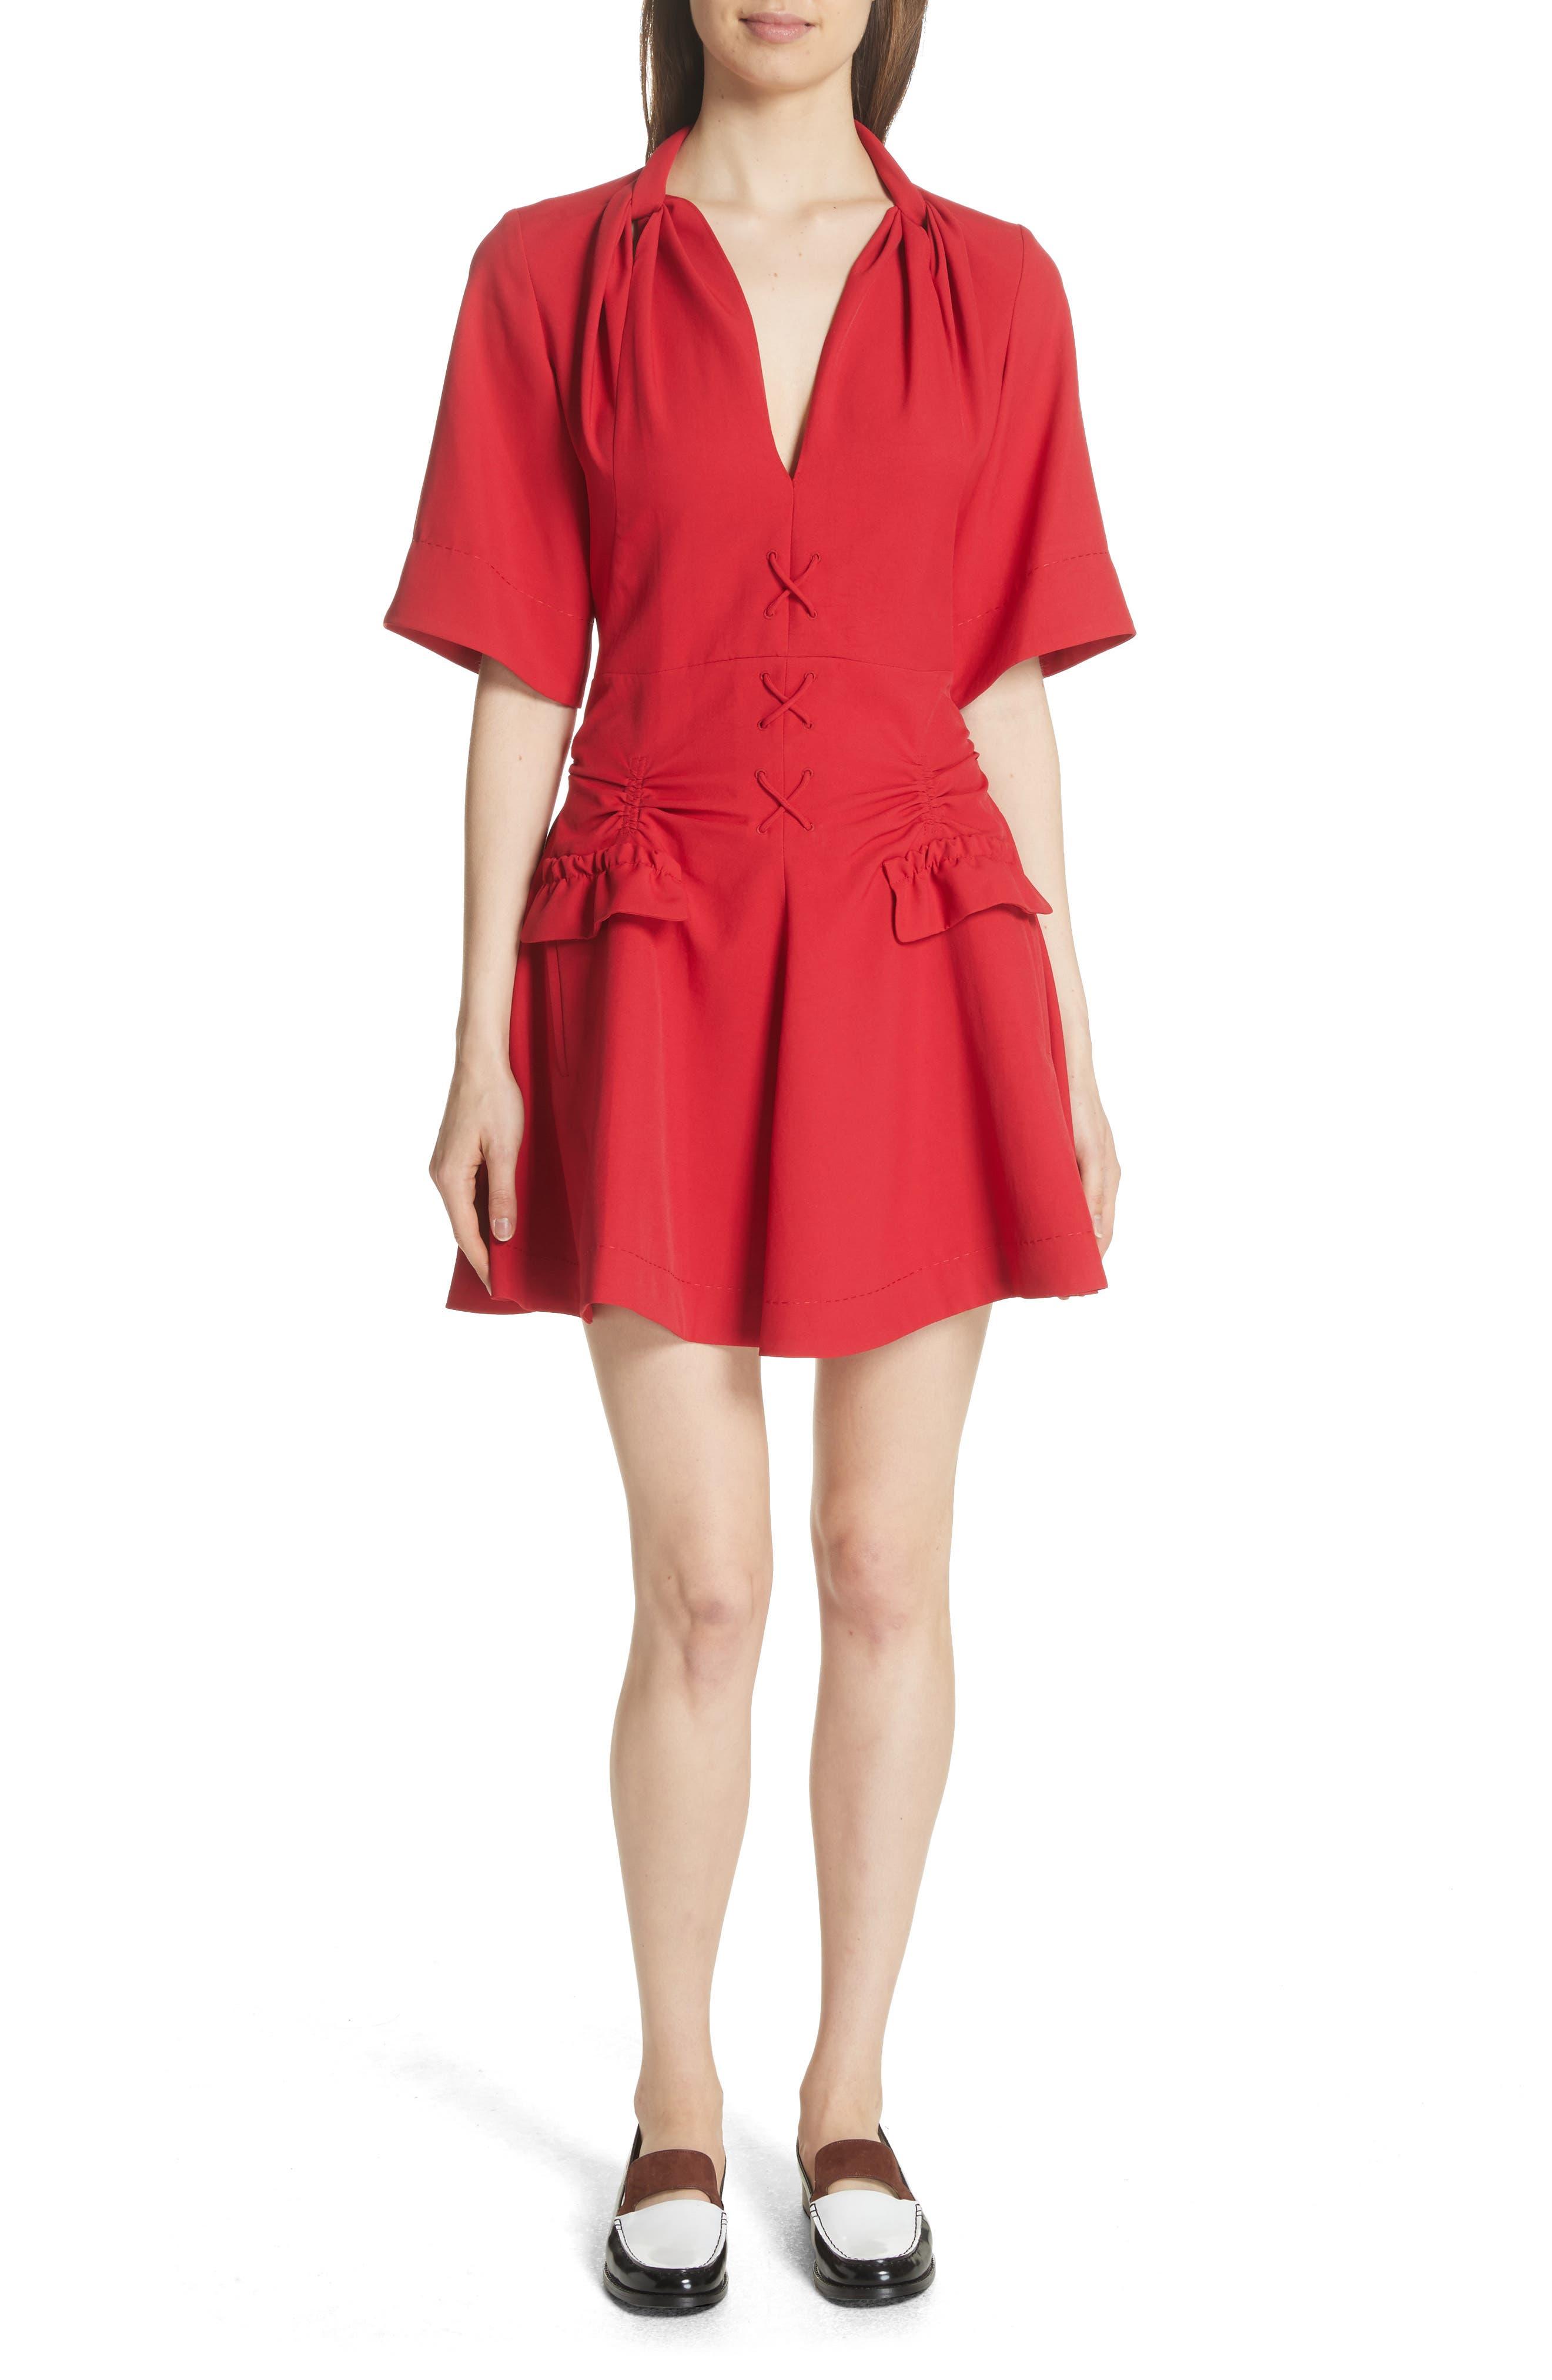 Main Image - Carven Robe Courte Lace-Up Dress